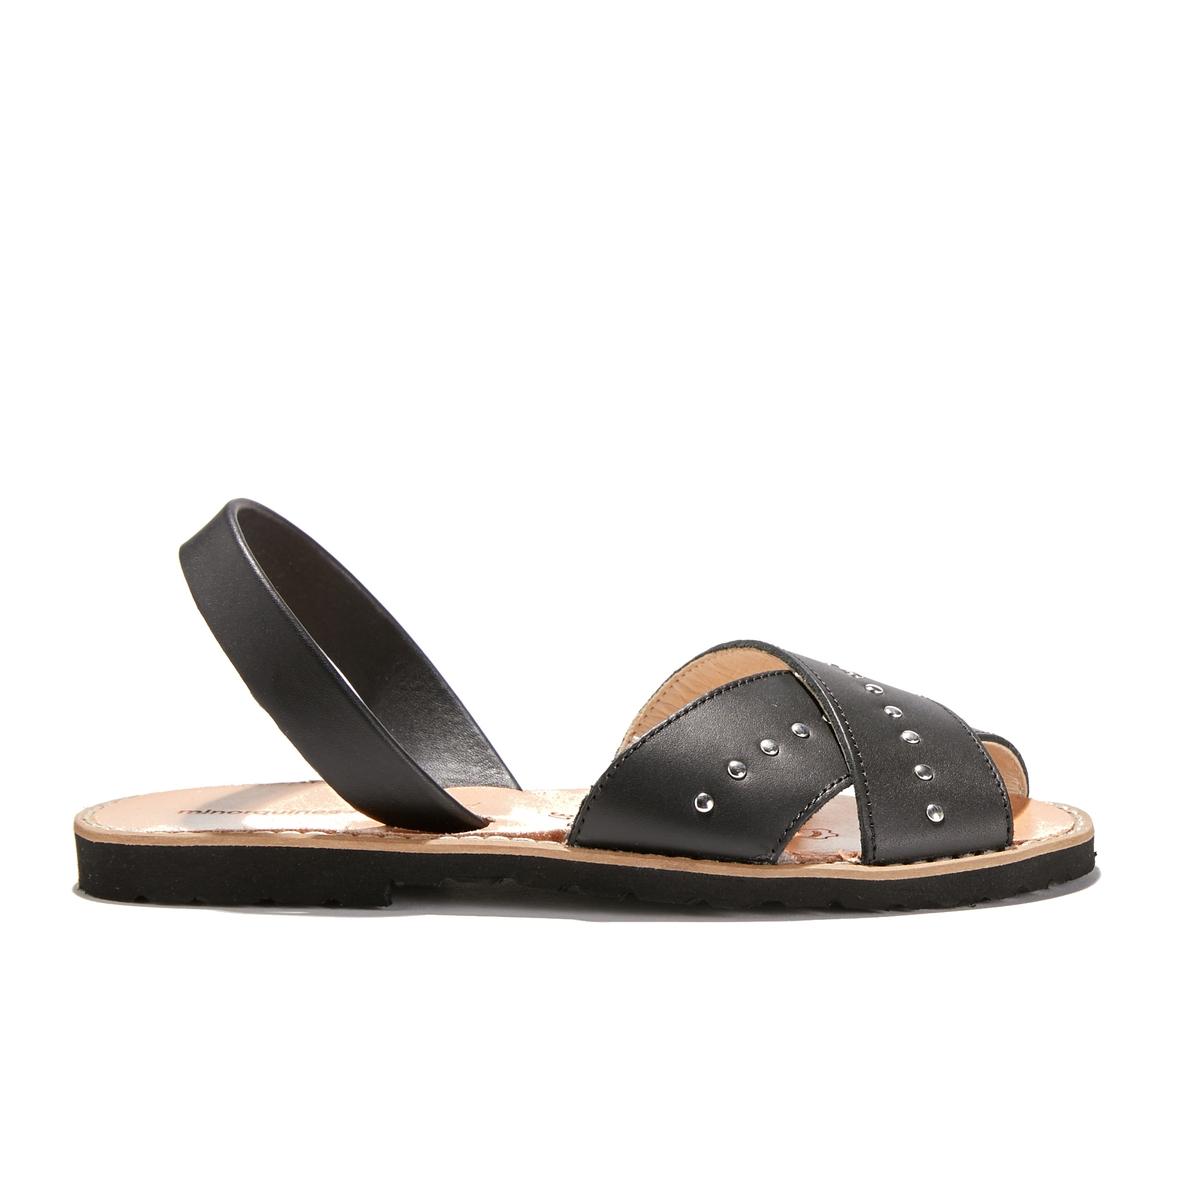 Босоножки из яловичной кожи на плоском каблуке AVARCA ROCK сапоги кожаные на плоском каблуке 1137